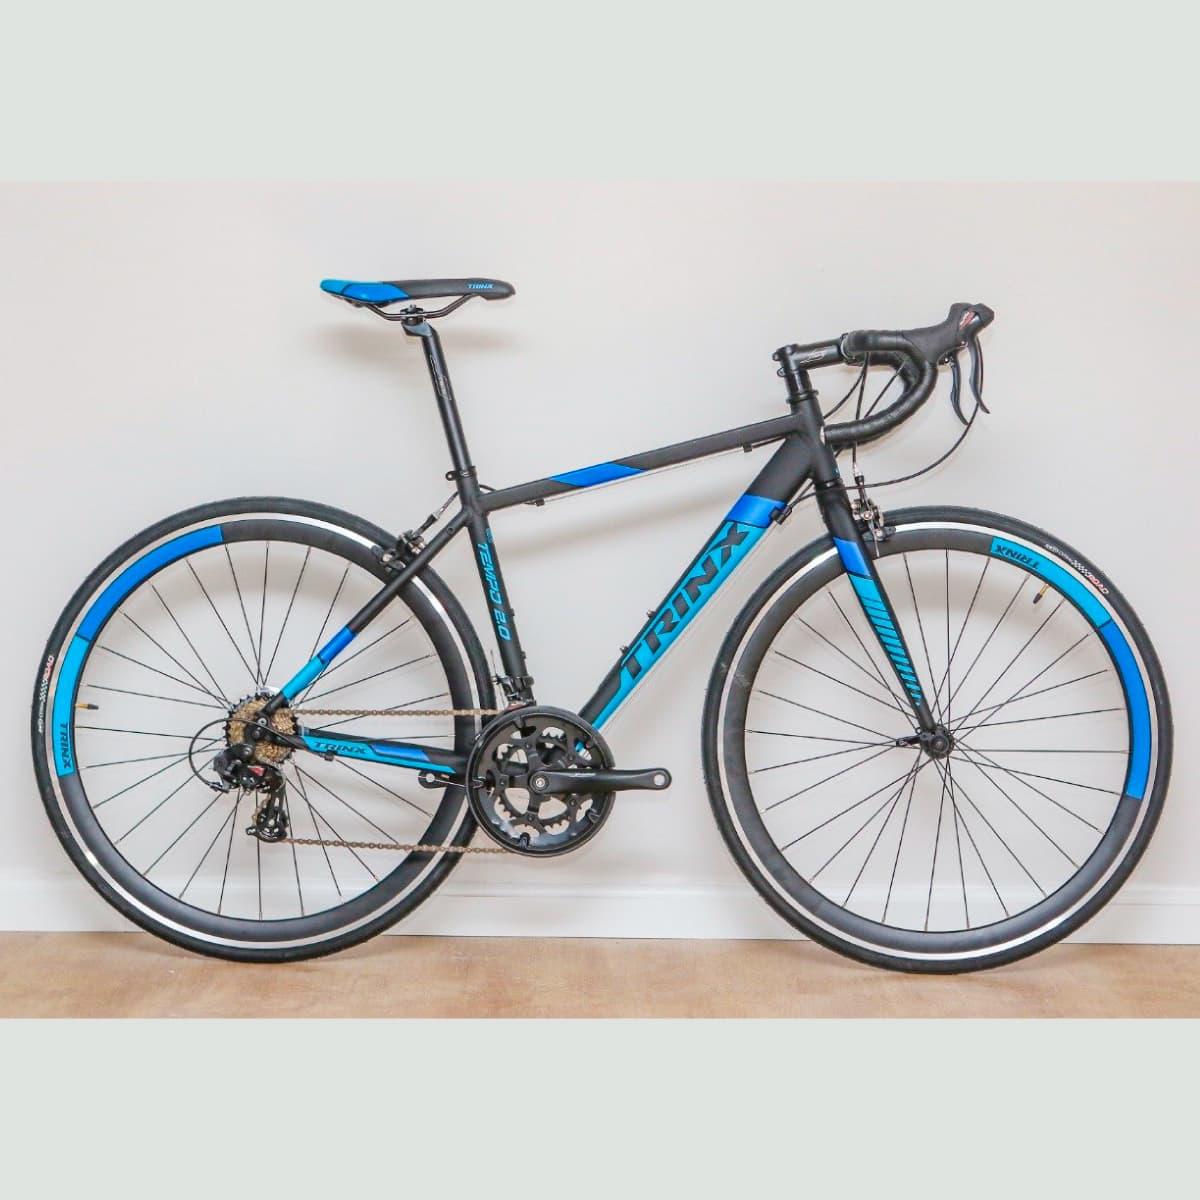 Bike Trinx Tempo 2.0 2020 14v Shimano Preto Azul